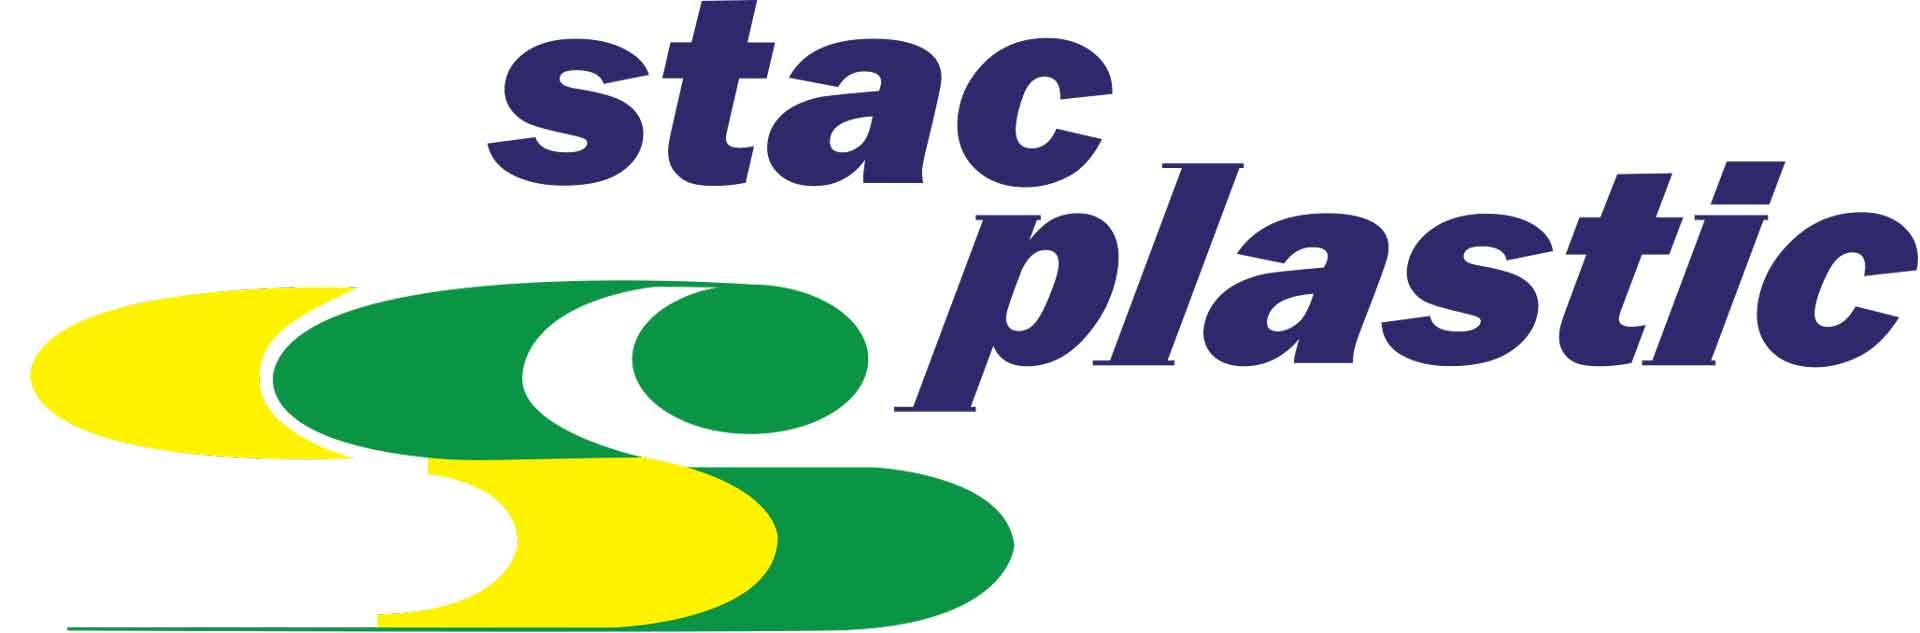 Stac Plastic - Stac Plastic